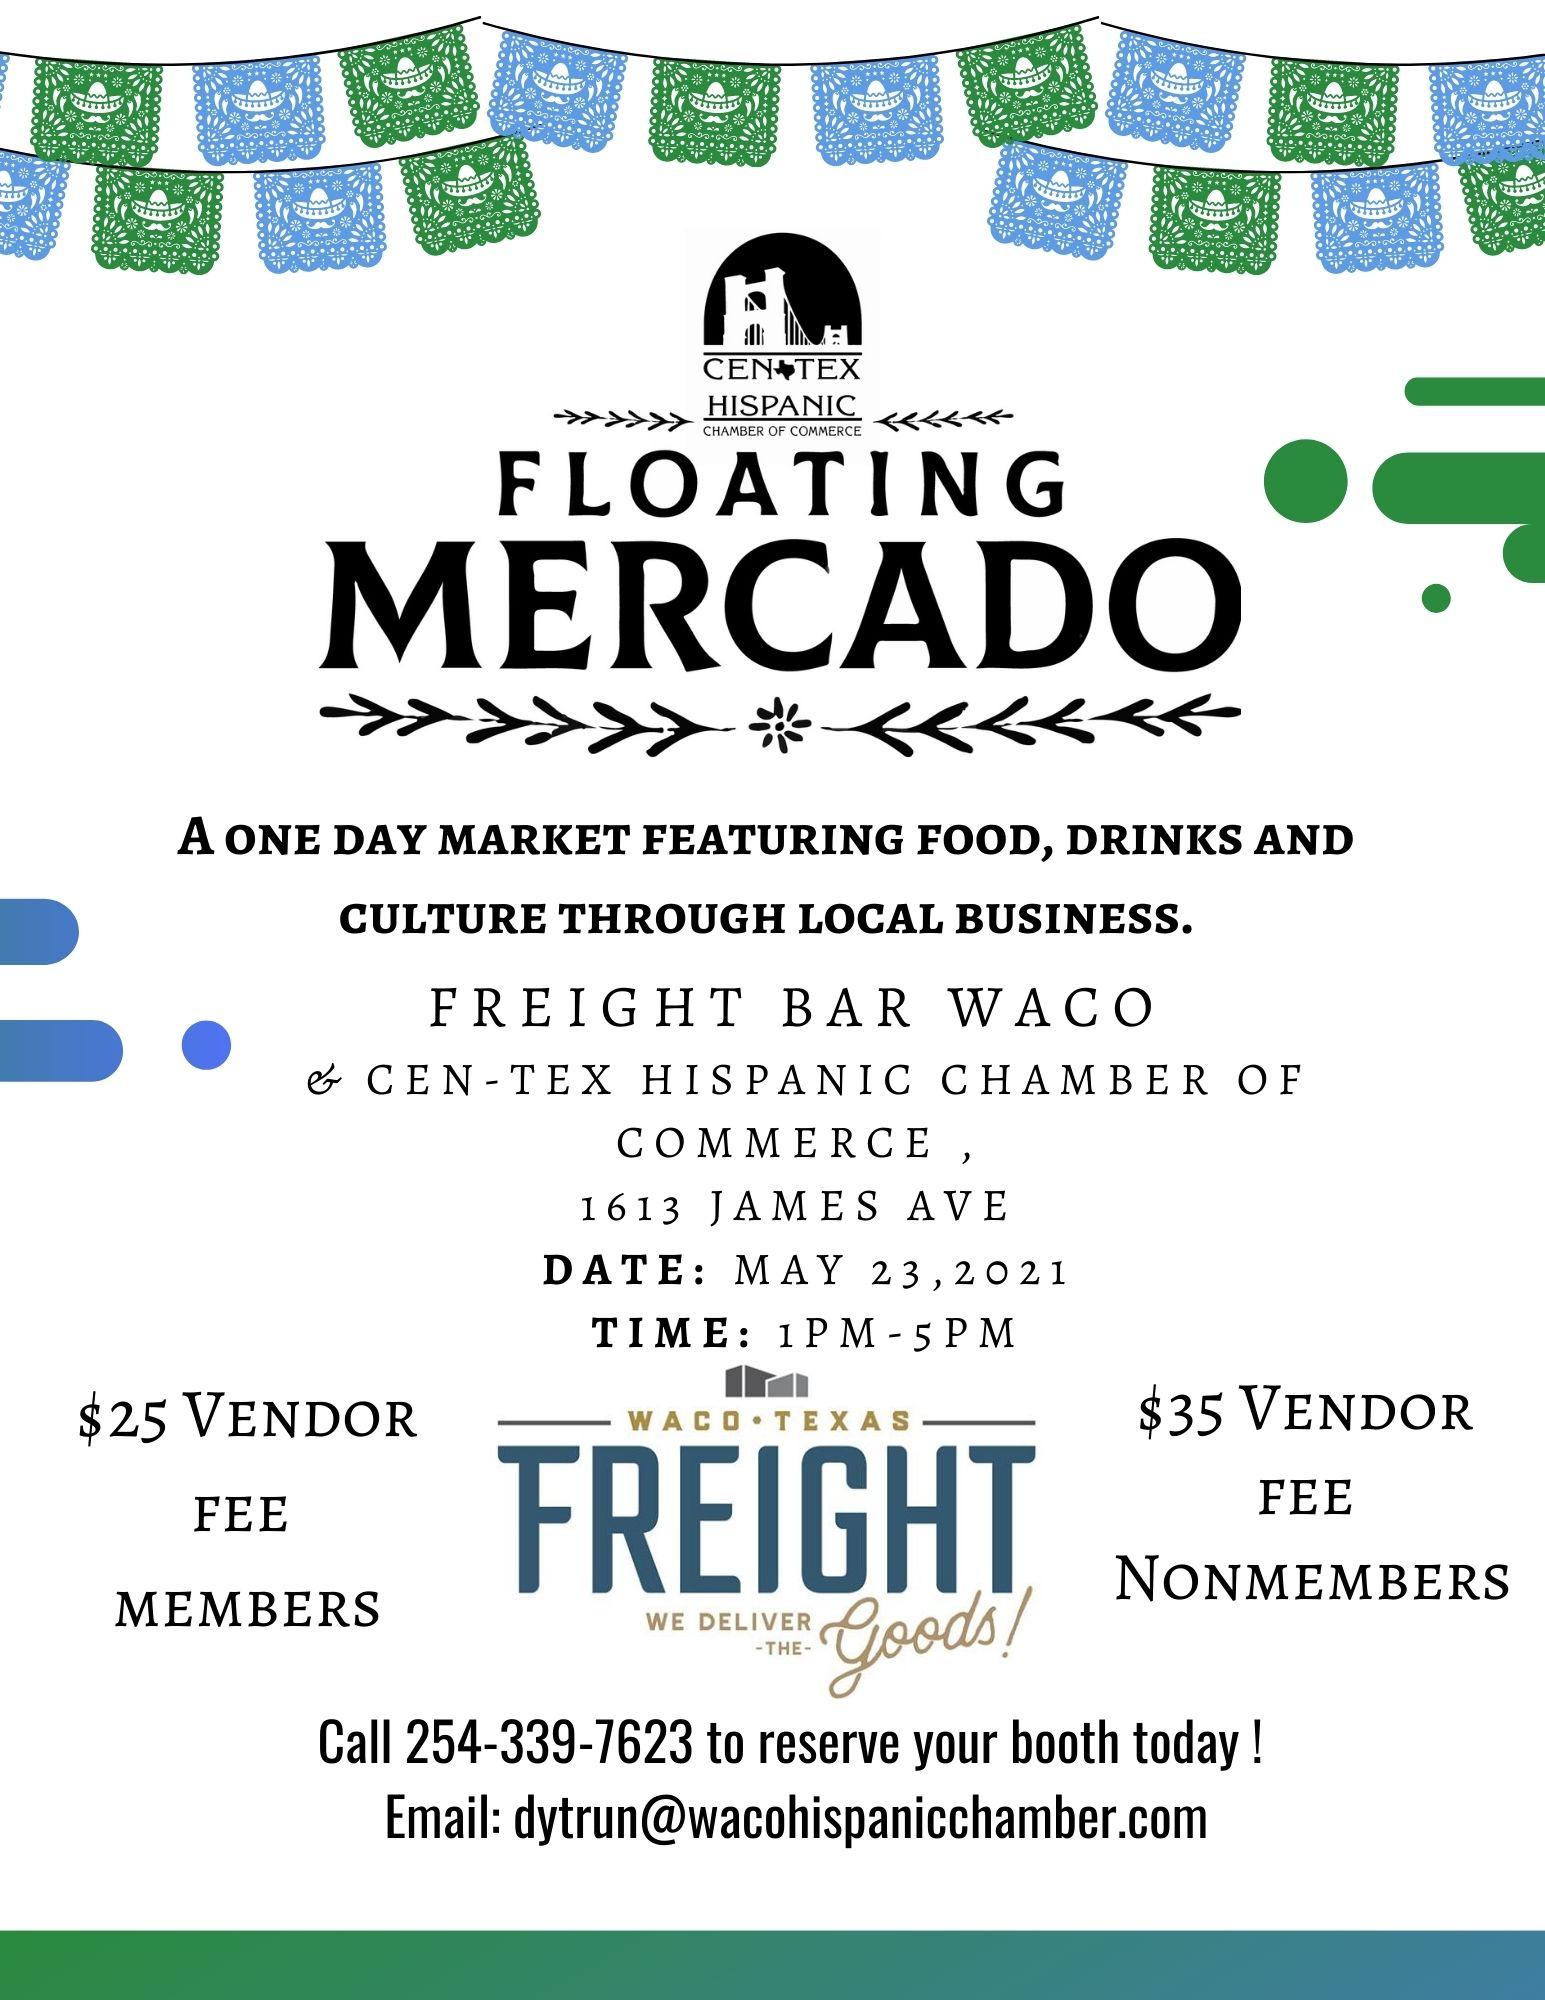 Freight Bar Waco Floating Mercado